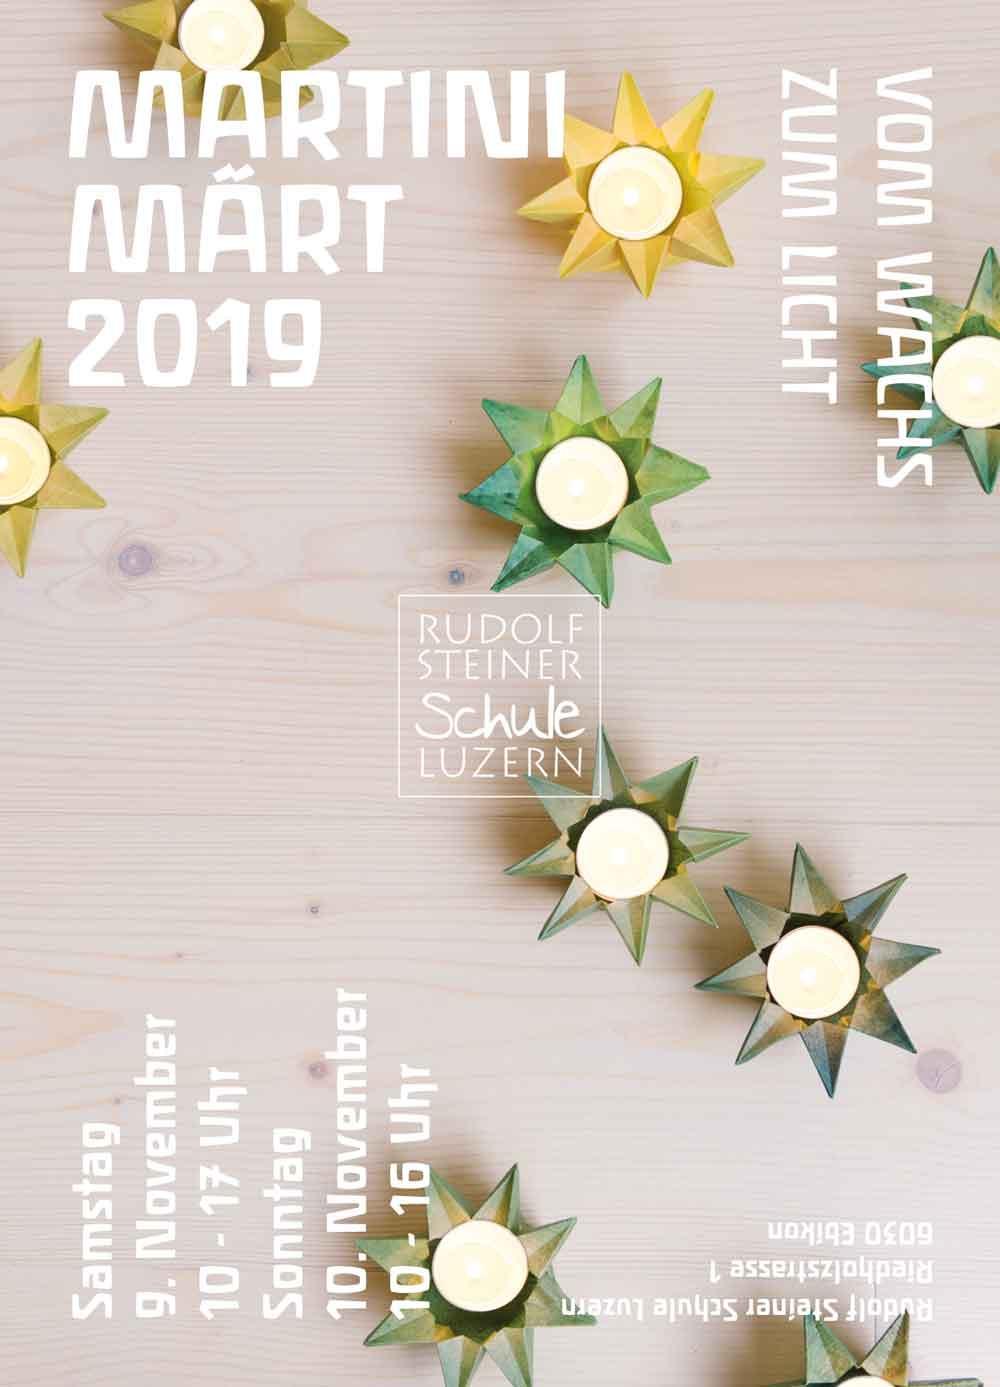 Martini-Märt Flyer 2019